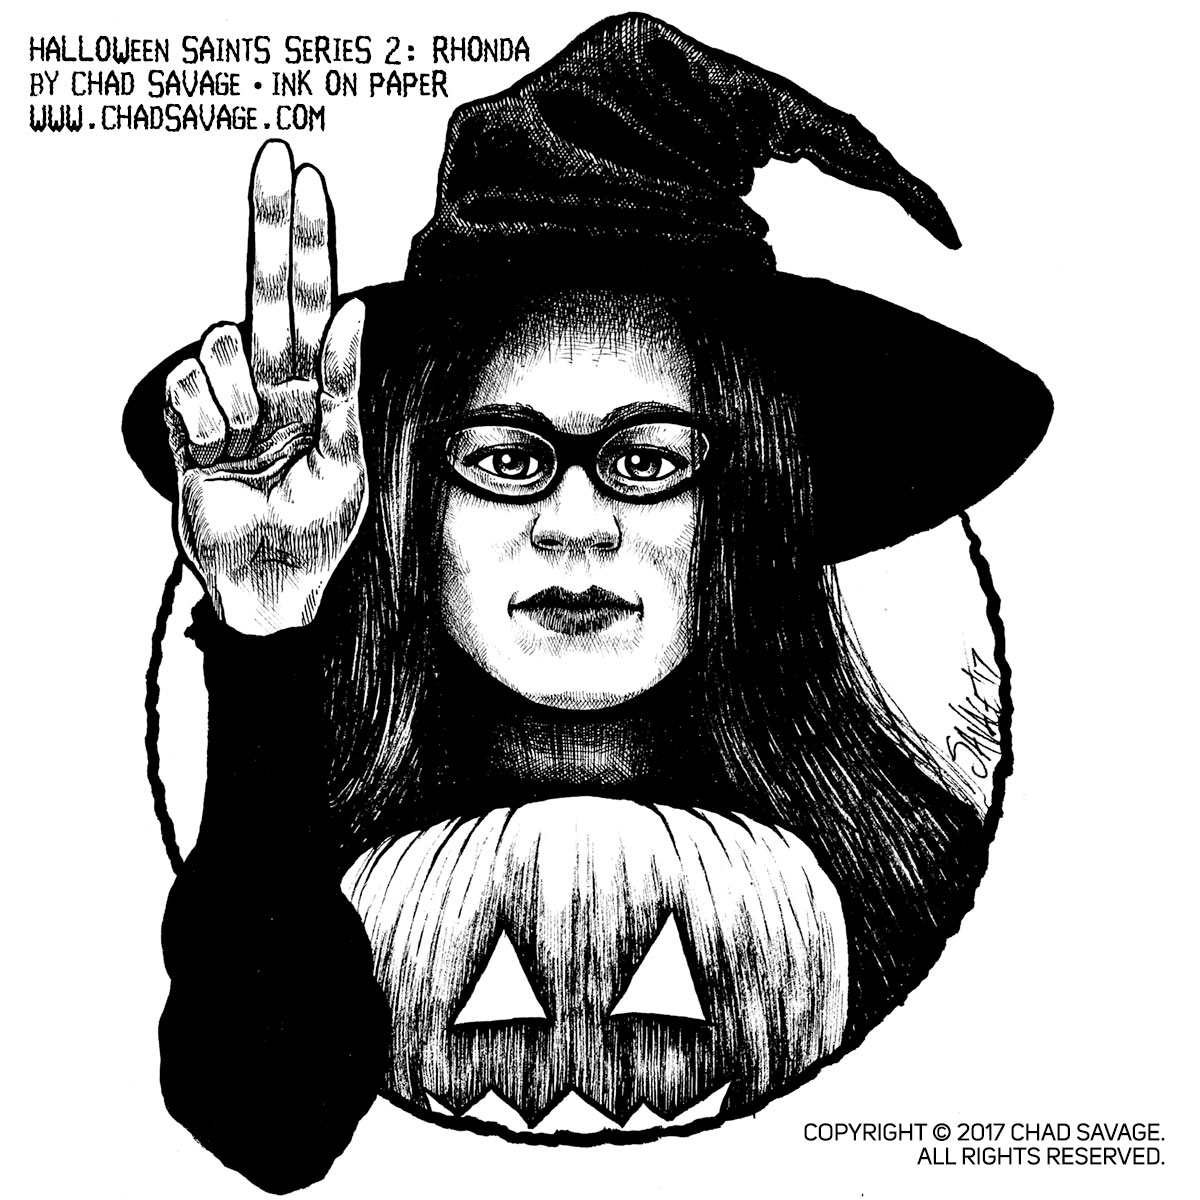 Halloween Saints Series 2: Rhonda Original Ink Art · ShopSinister ...